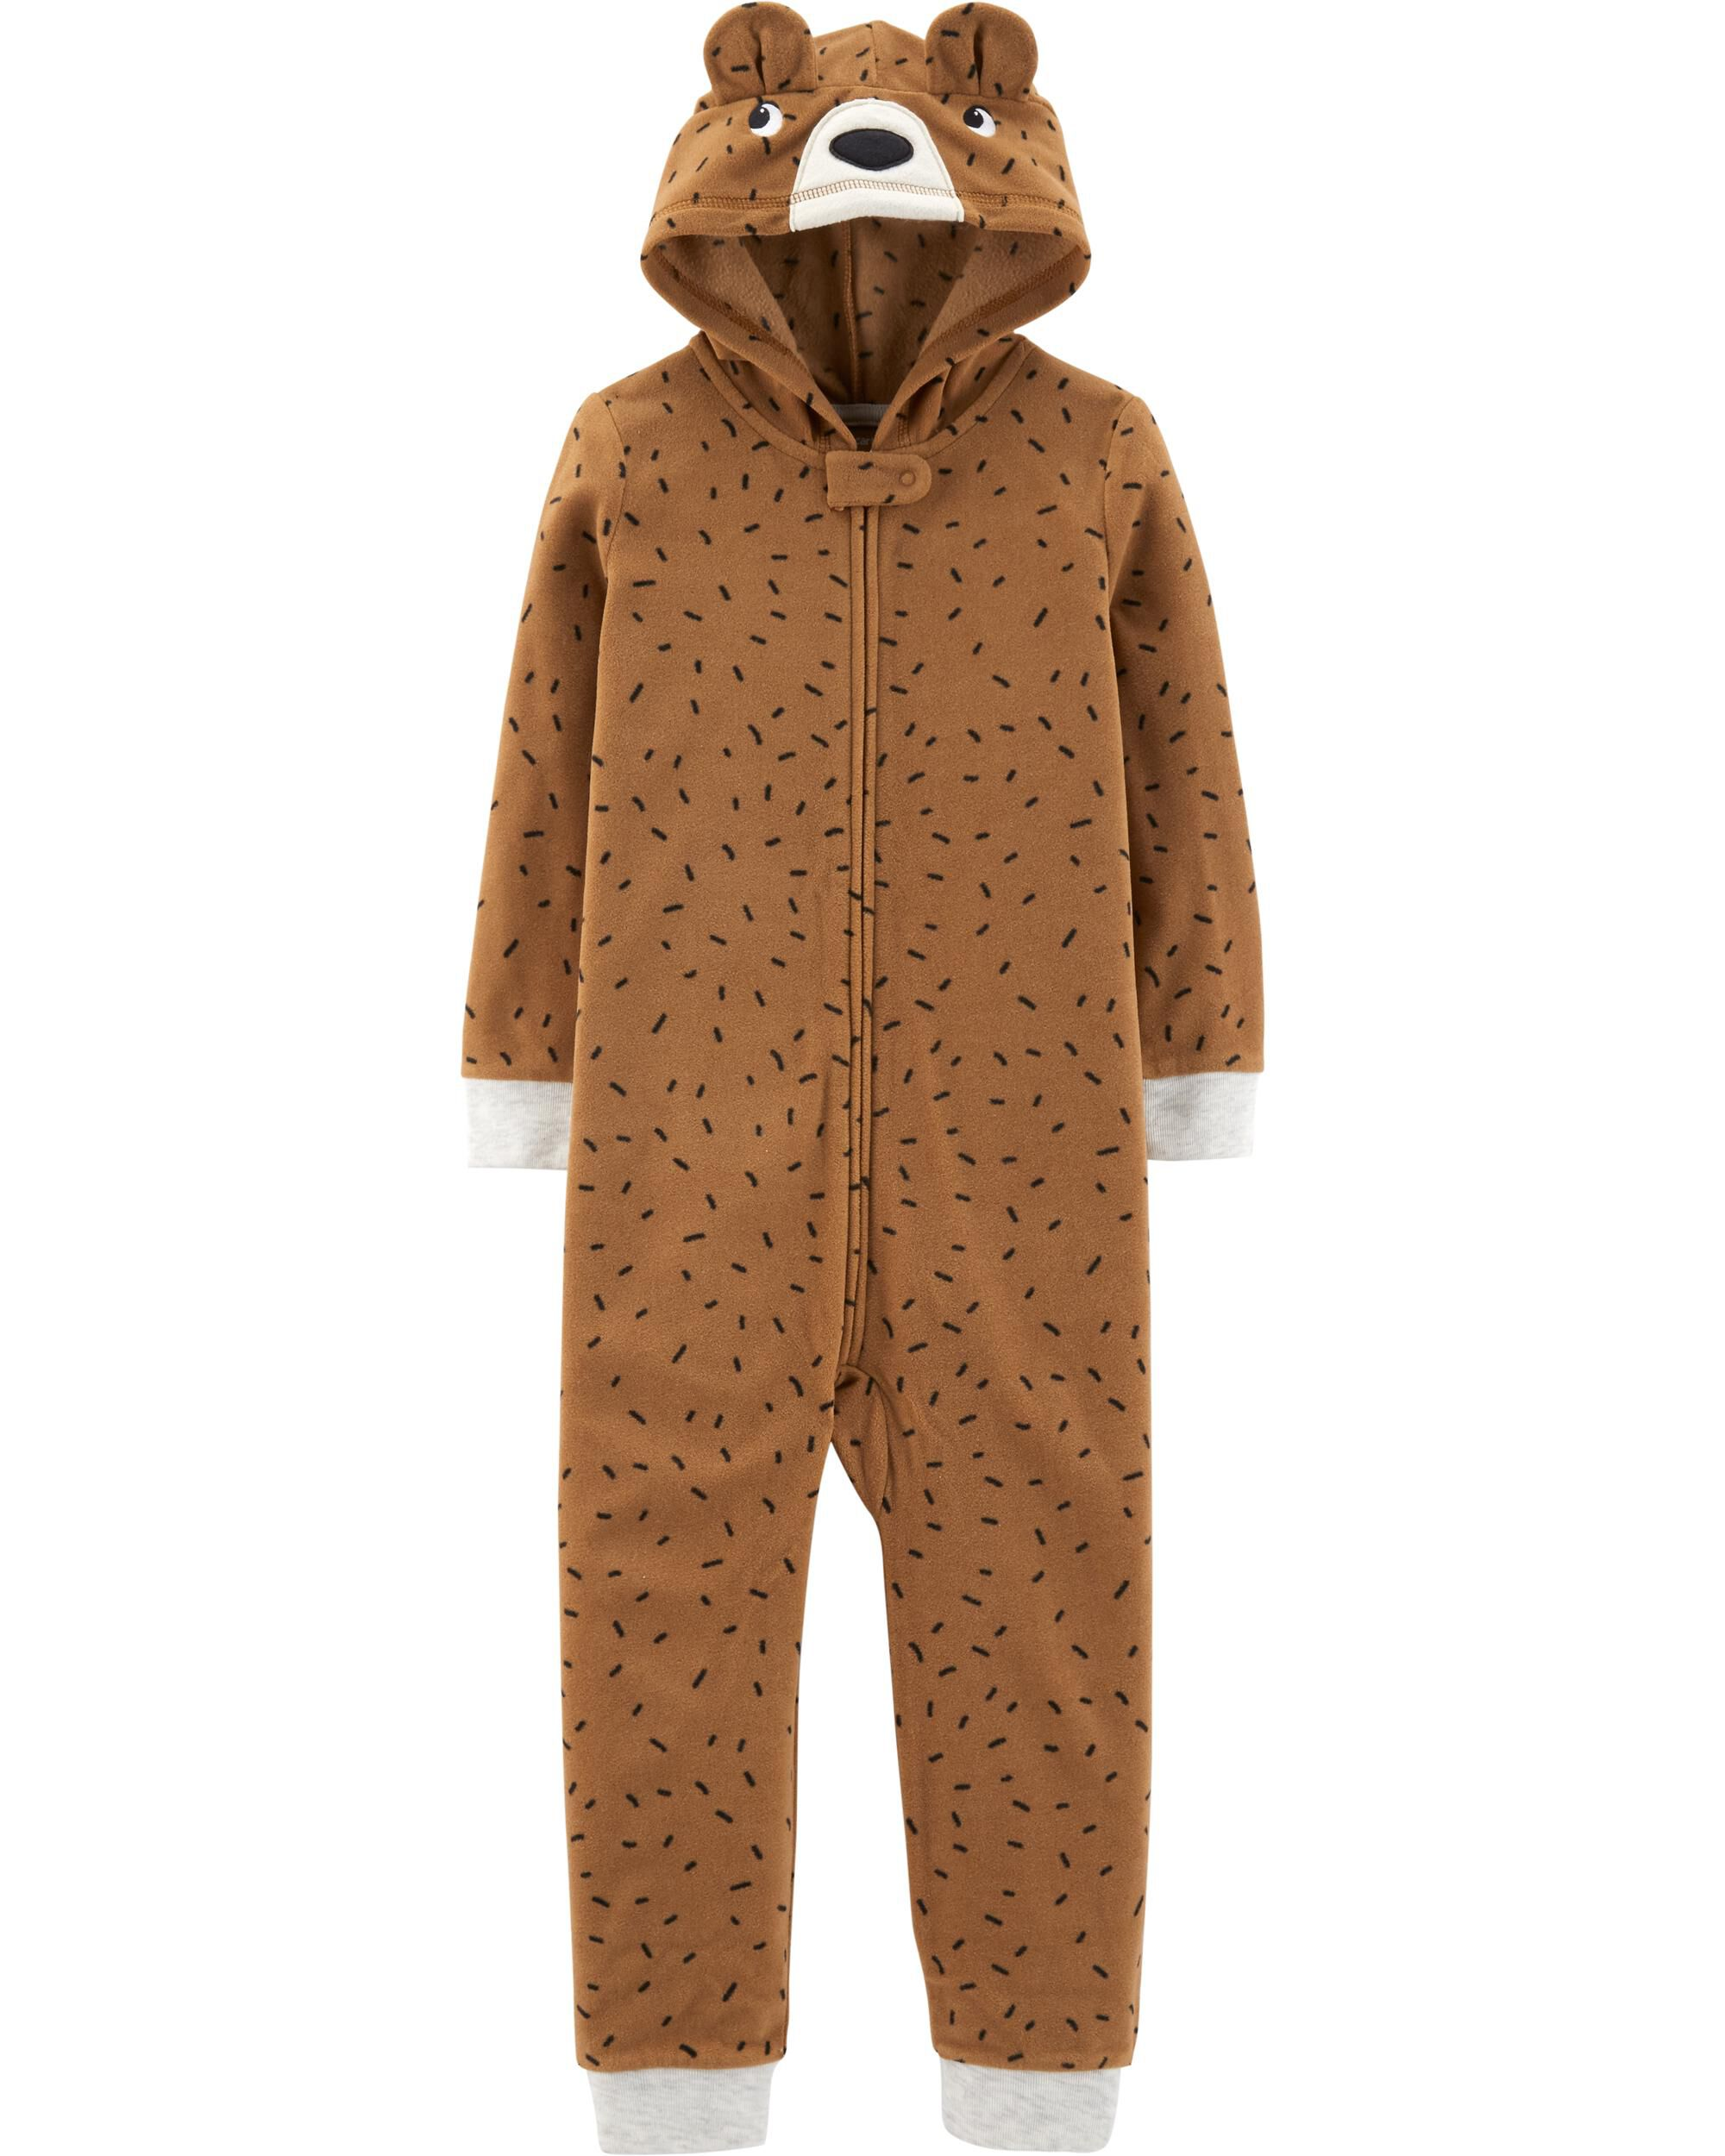 5d7765aba 1-Piece Bear Hooded Fleece Footless PJs